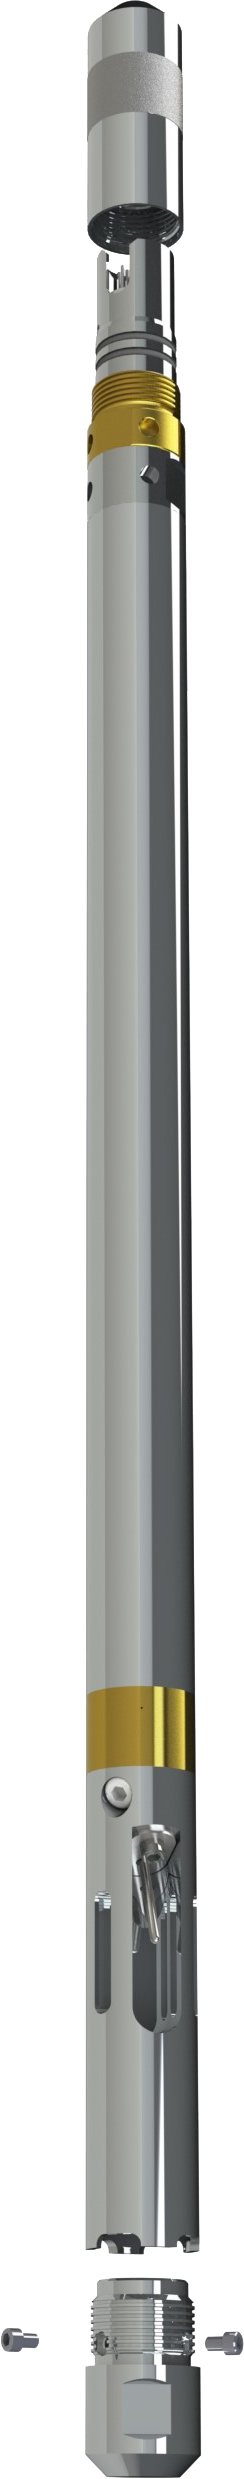 Pressure-Temperature-Flow (PTF) Sensor